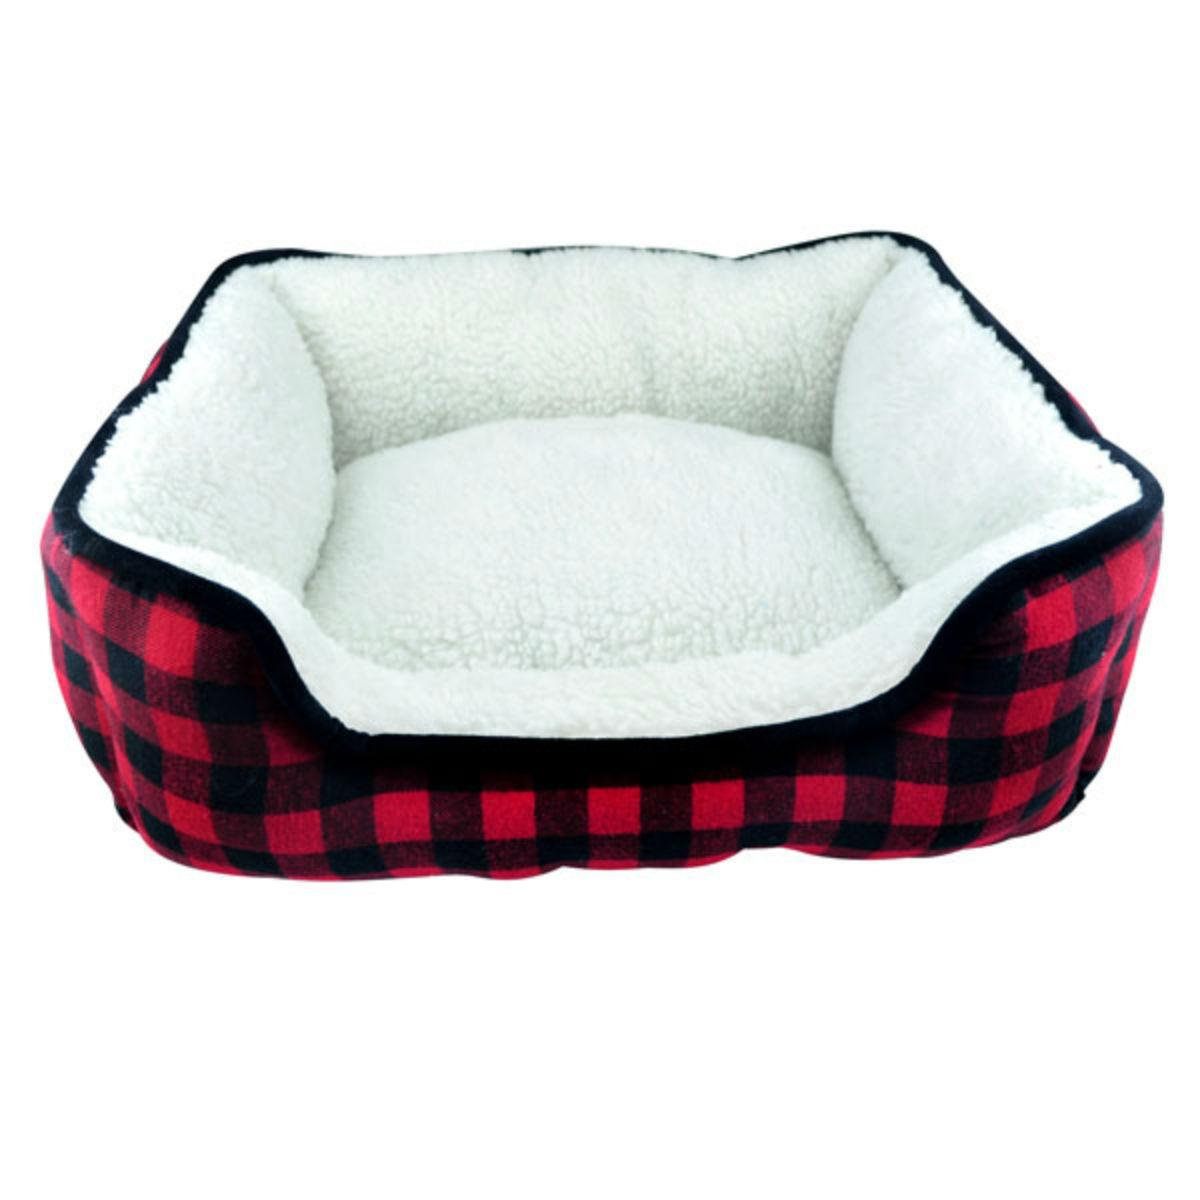 Slumber Pet Cuddler Dog Bed - Buffalo Red Plaid